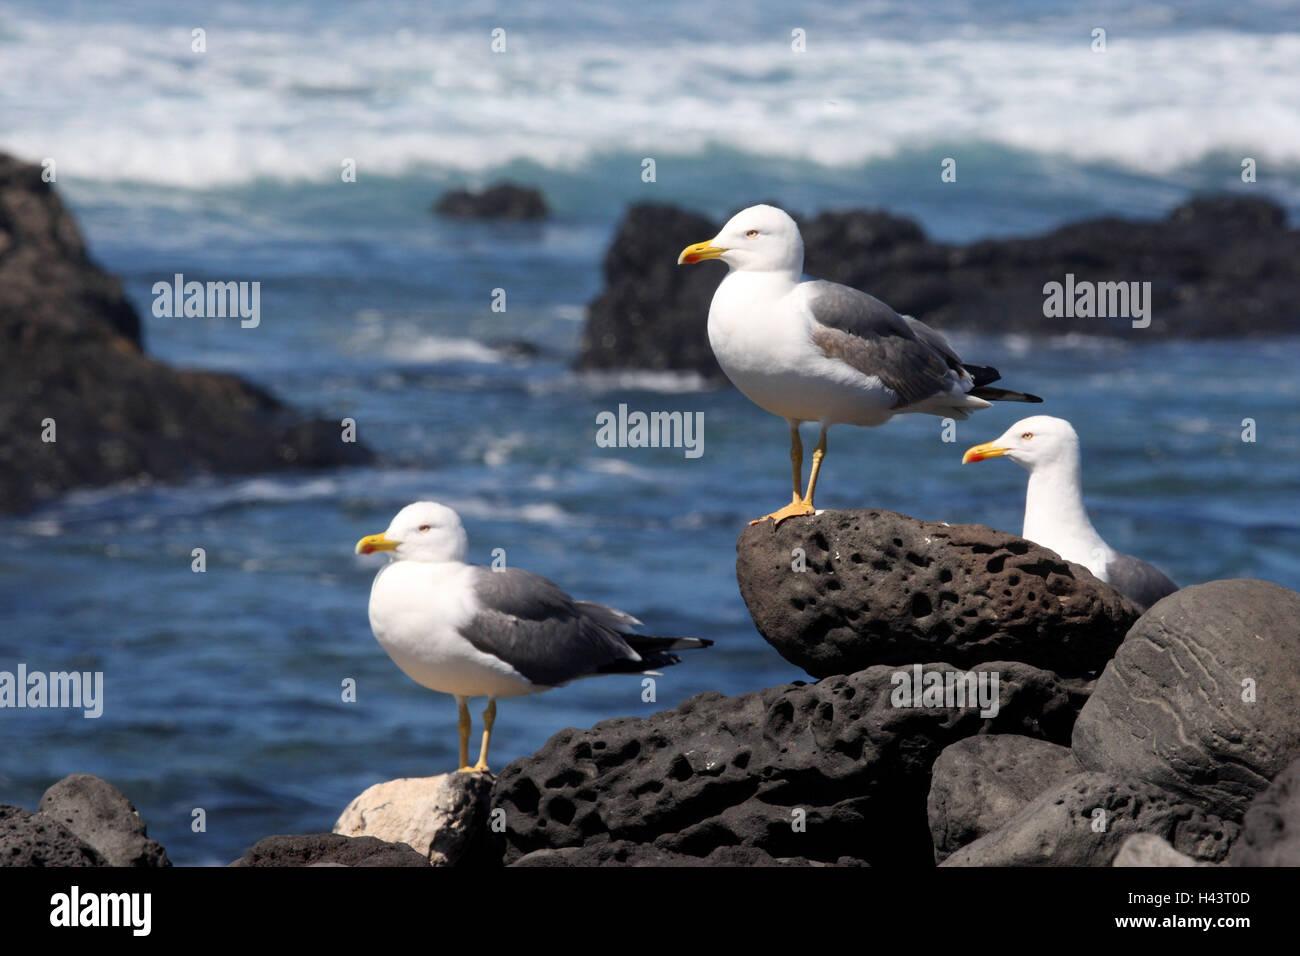 Spain, the Canaries, Lanzarote, coast, herring gulls, Larus fuscus, - Stock Image